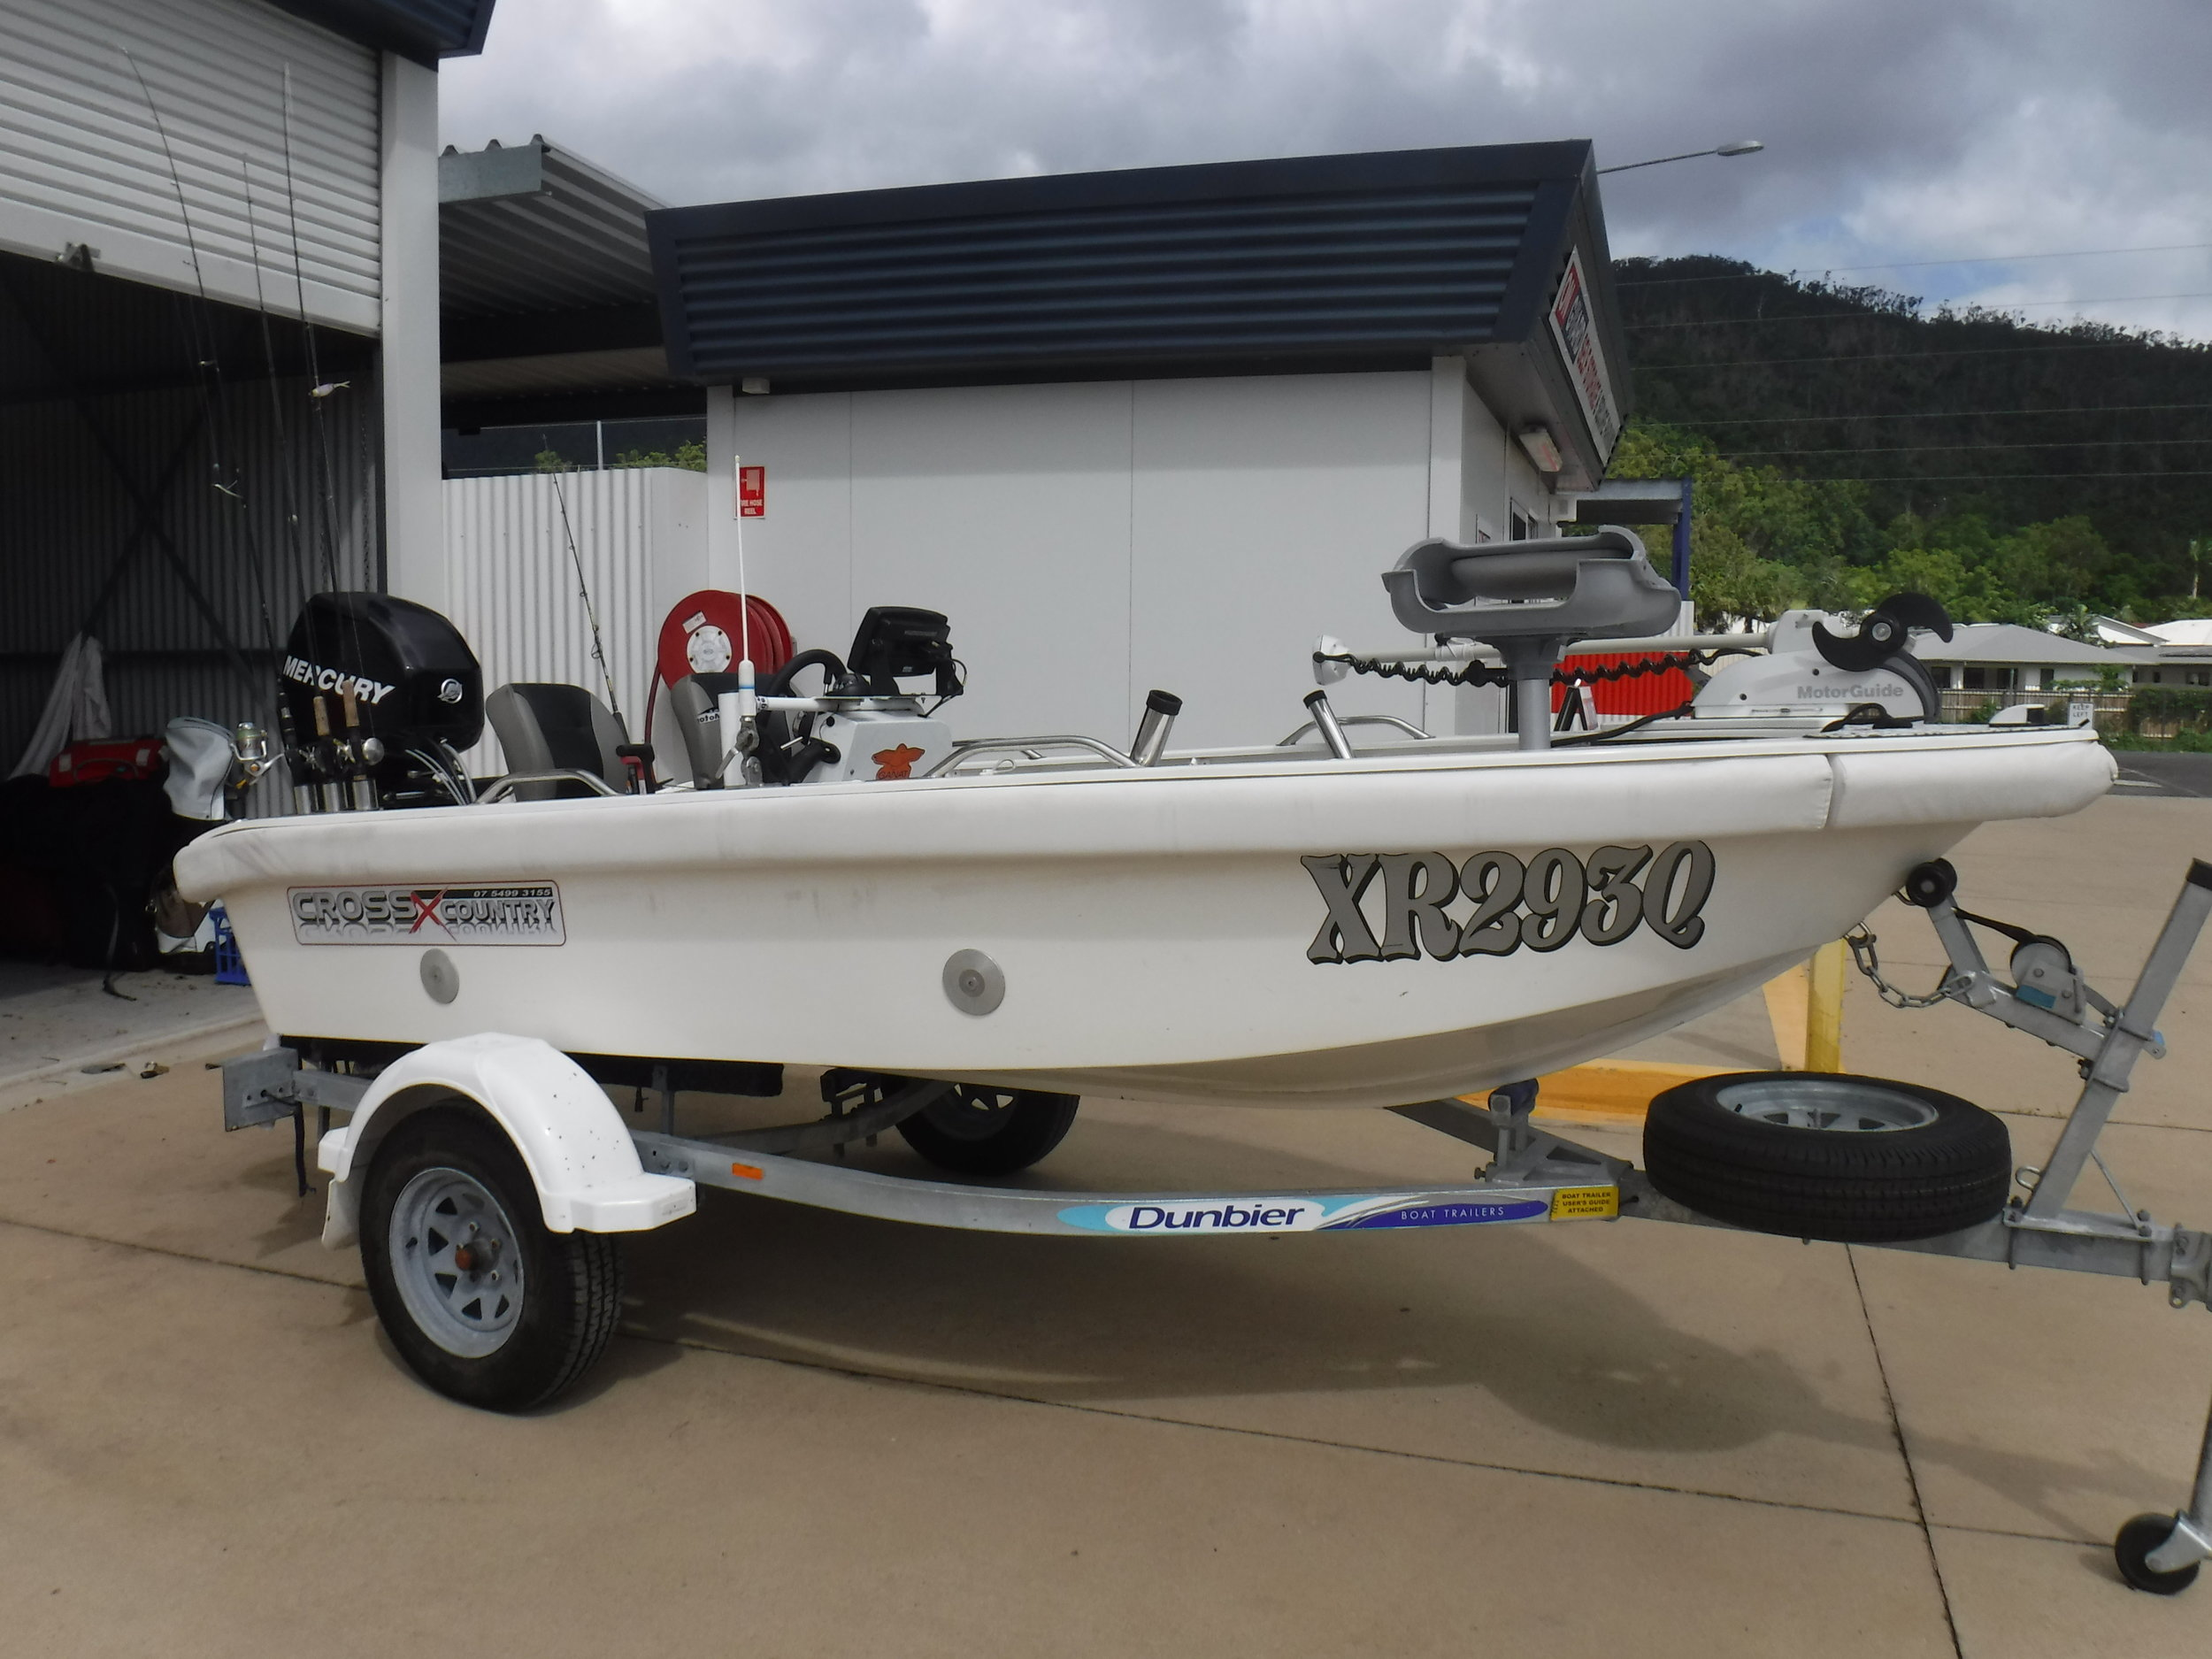 bonefish and new boats 292.JPG